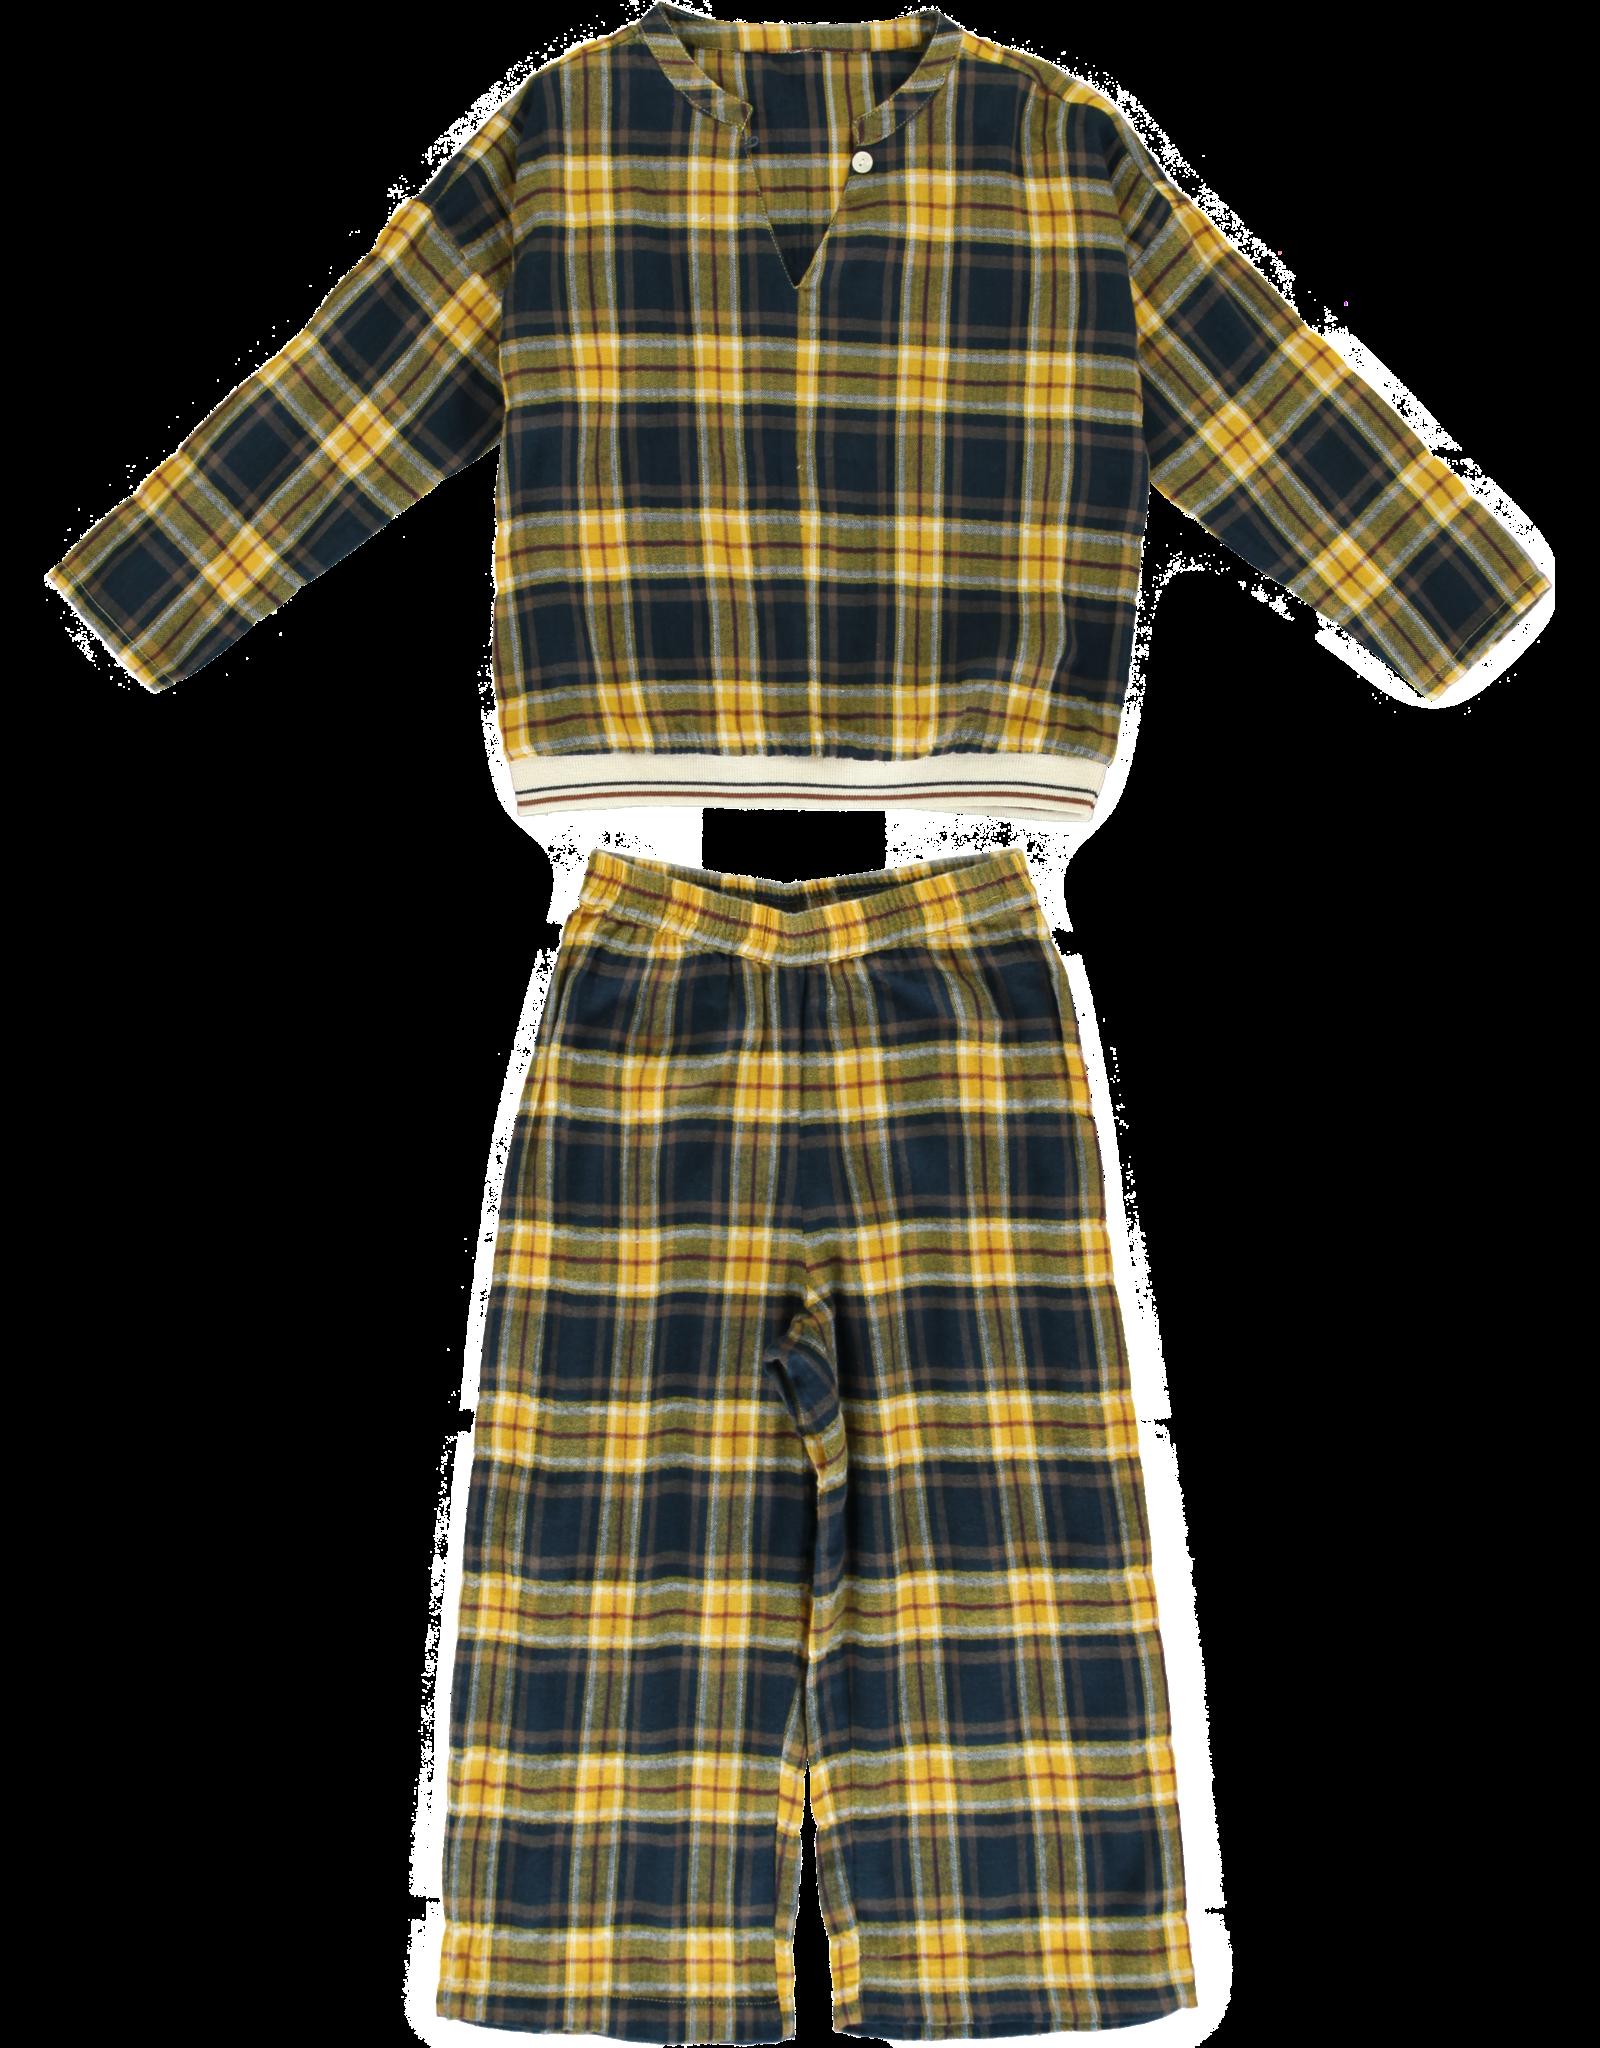 Dorélit Deline + Alkes | Pajama Set Woven | Check Navy